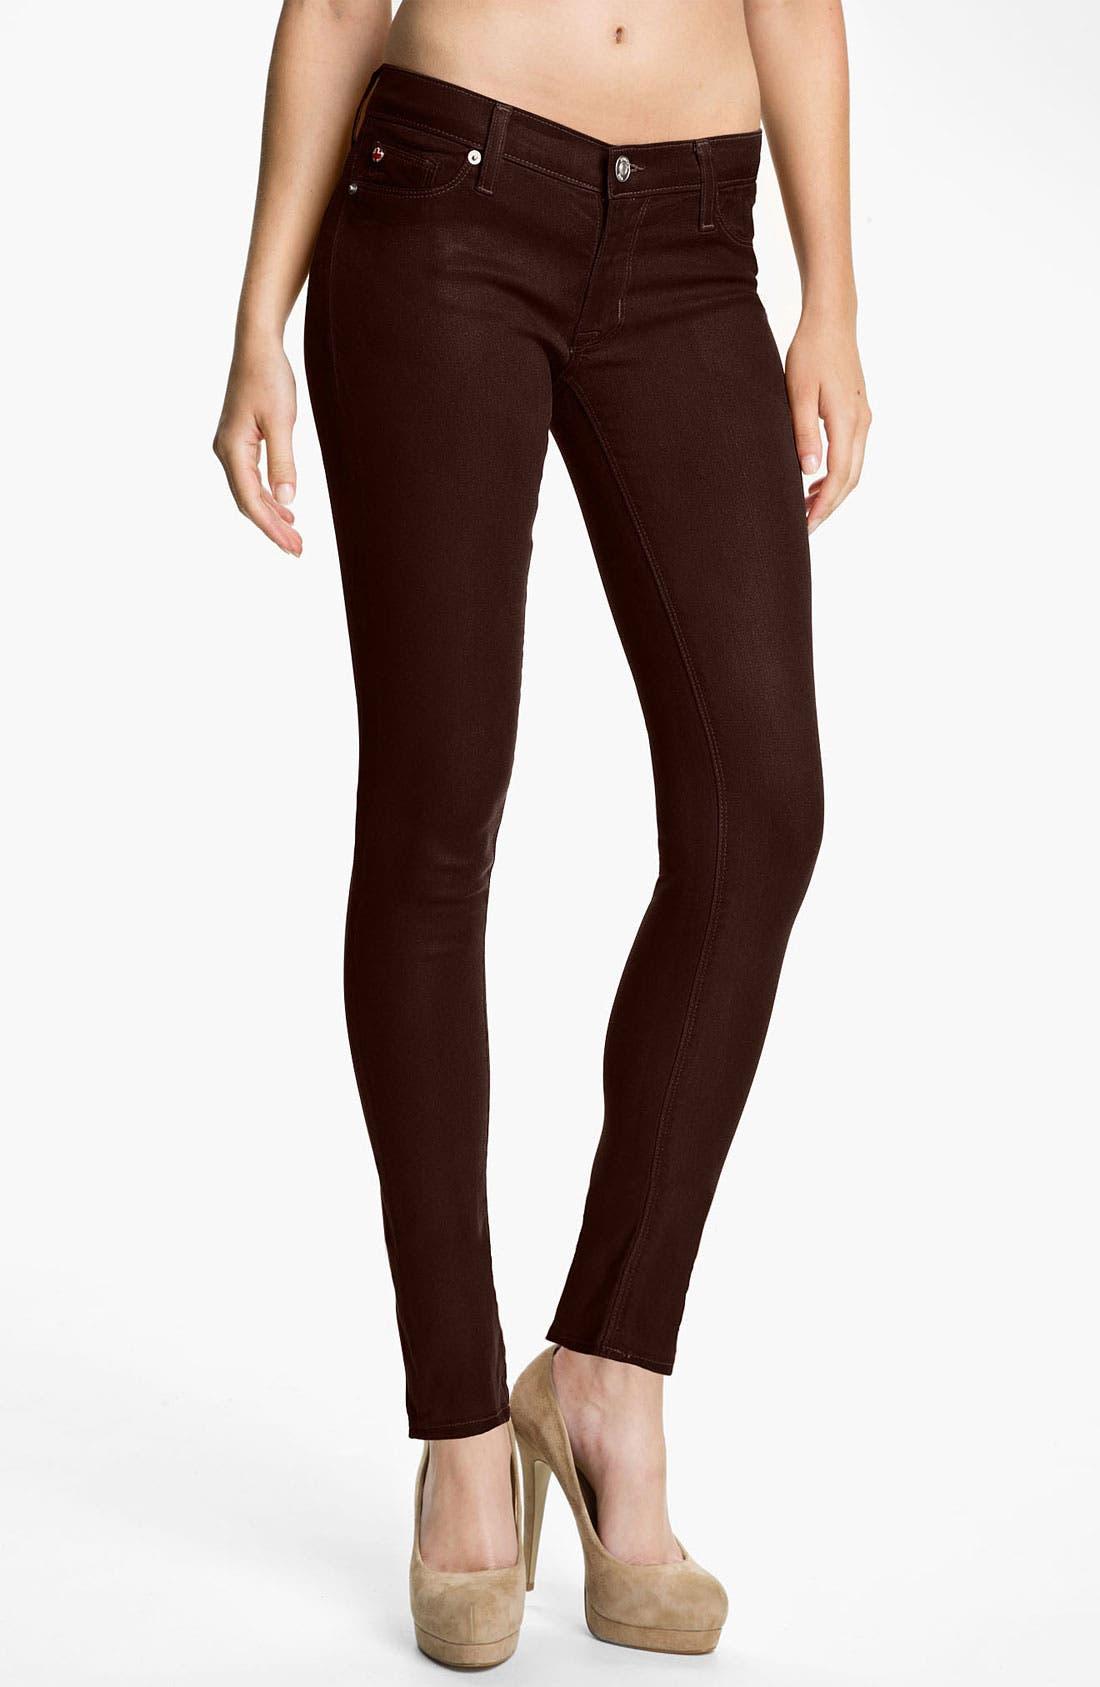 Main Image - Hudson Jeans 'Krista' Super Skinny Jeans (Stout Wax)